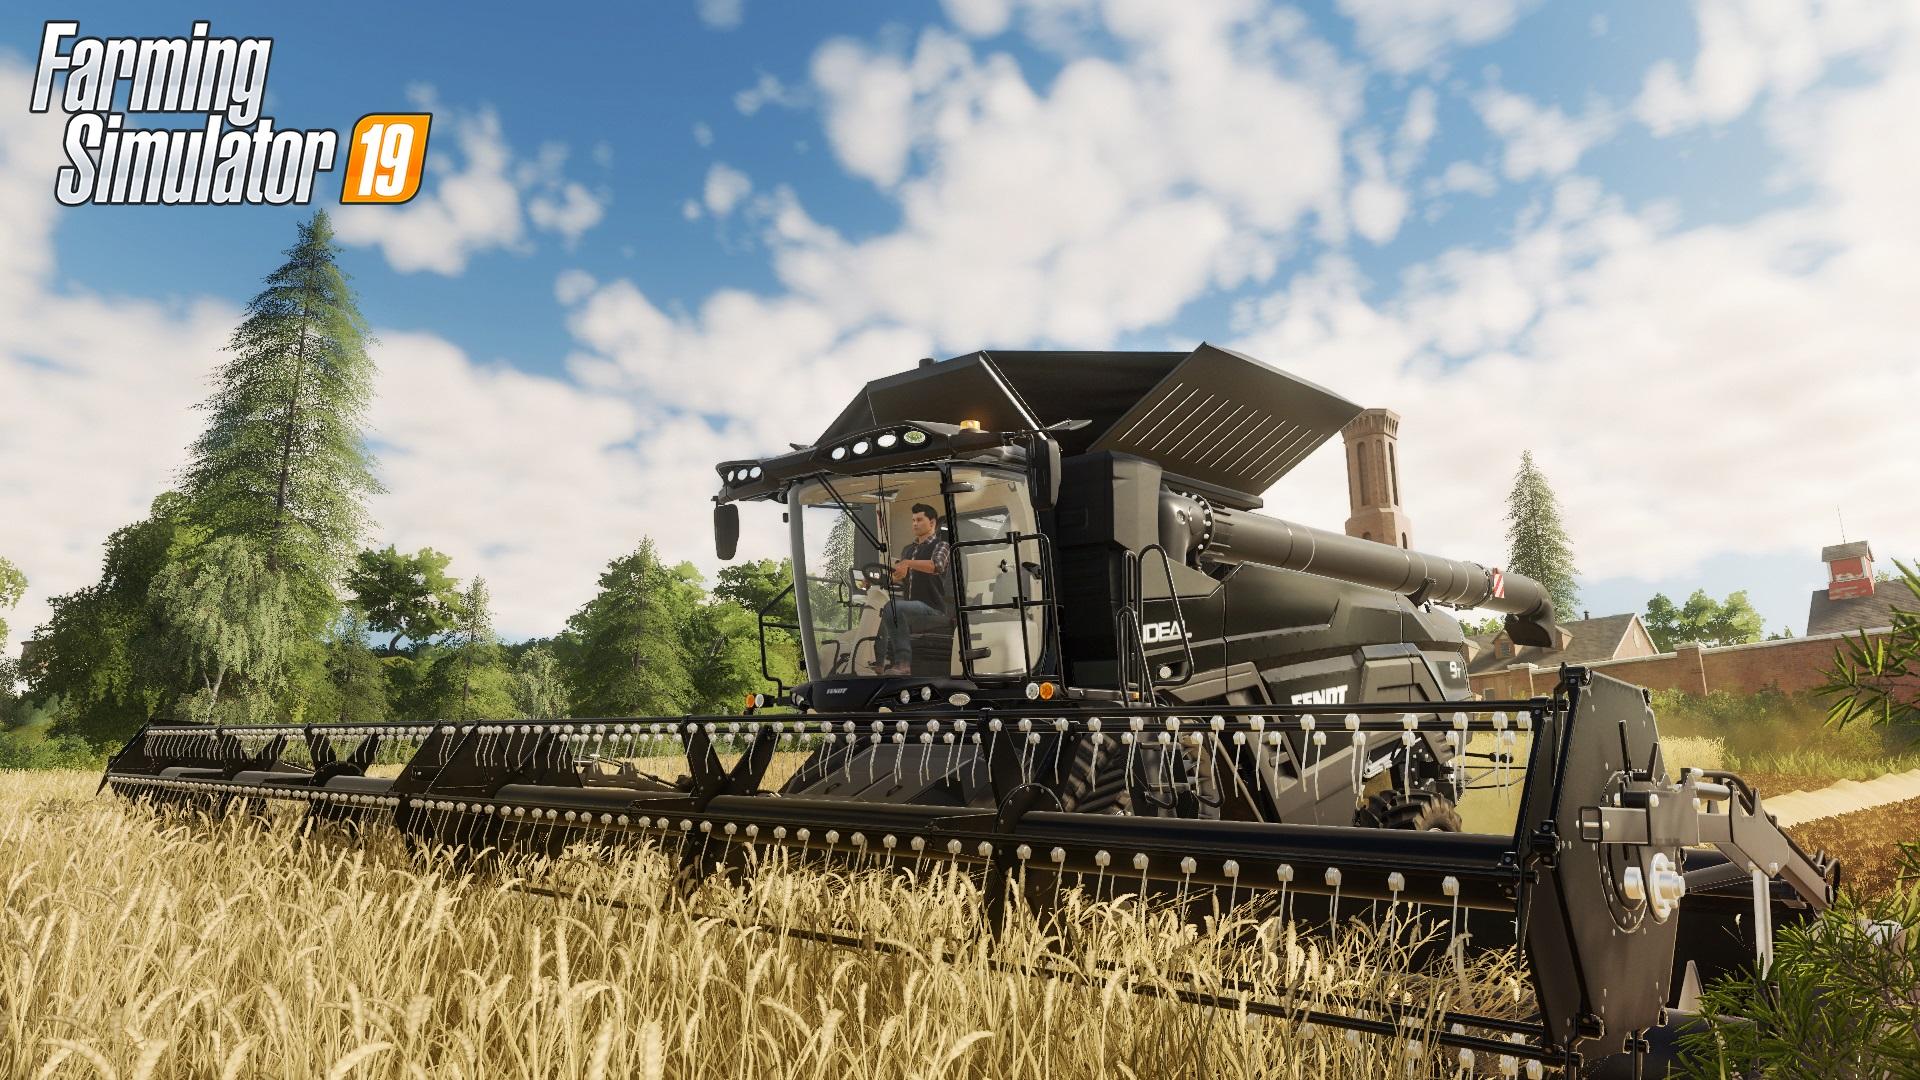 Farming Simulator 19 Release